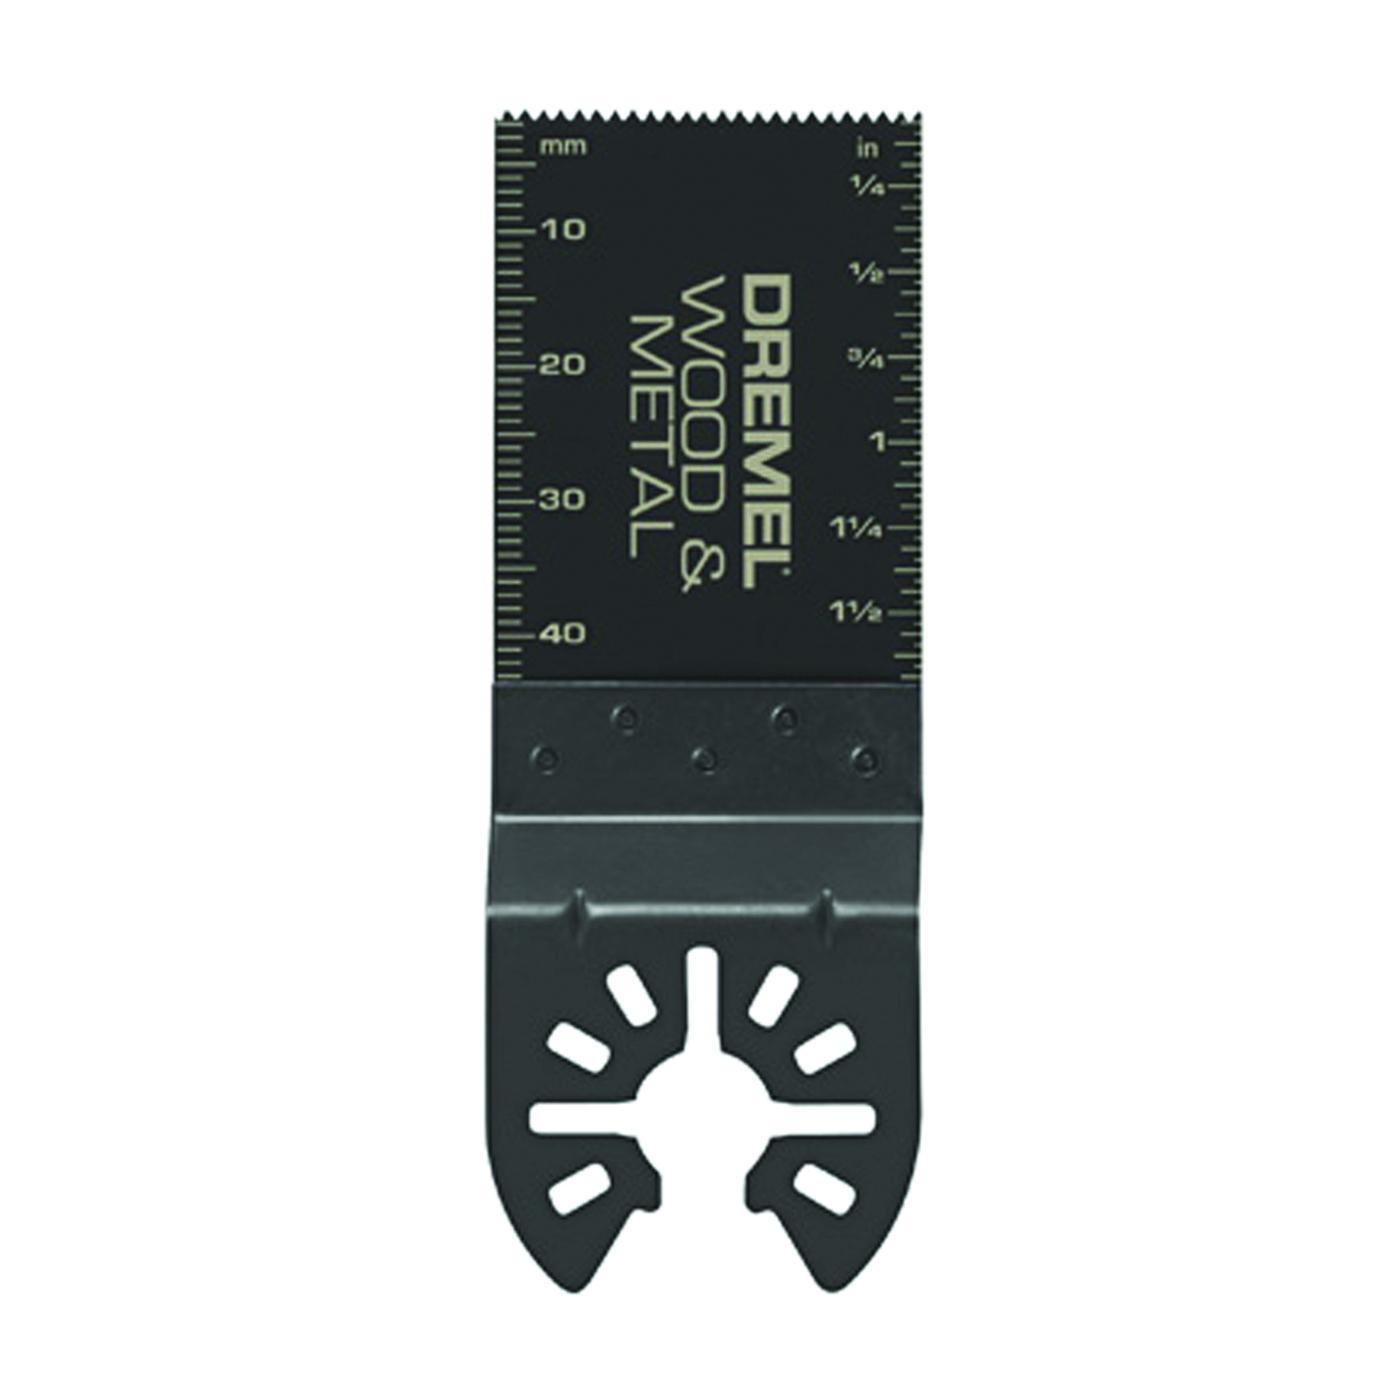 Picture of DREMEL MM482 Oscillating Blade, 1-5/8 in D Cutting, Bi-Metal